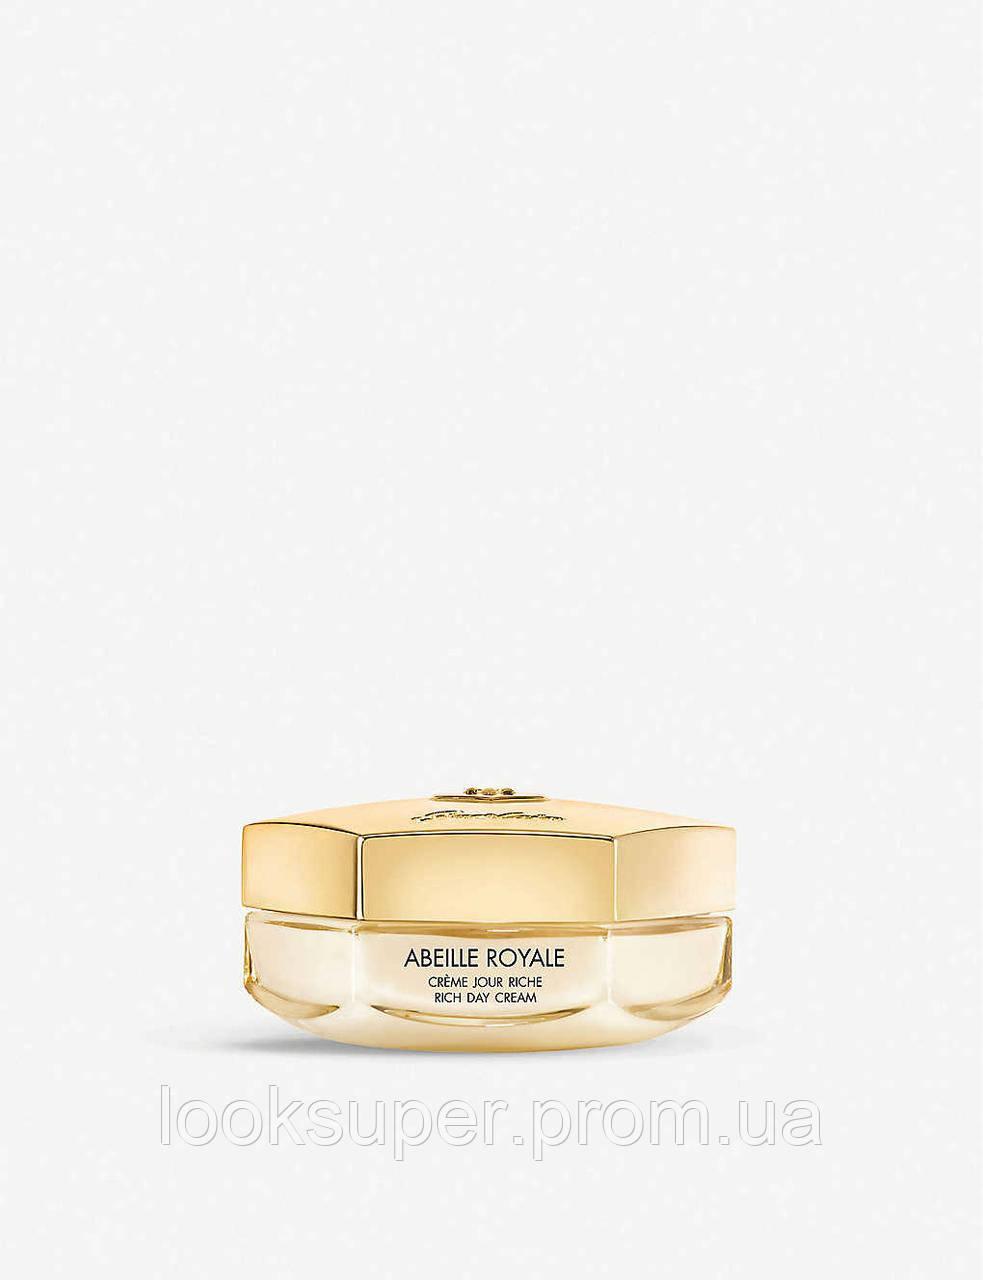 Крем Guerlain Abeille Royale Rich Day Cream (50ml)